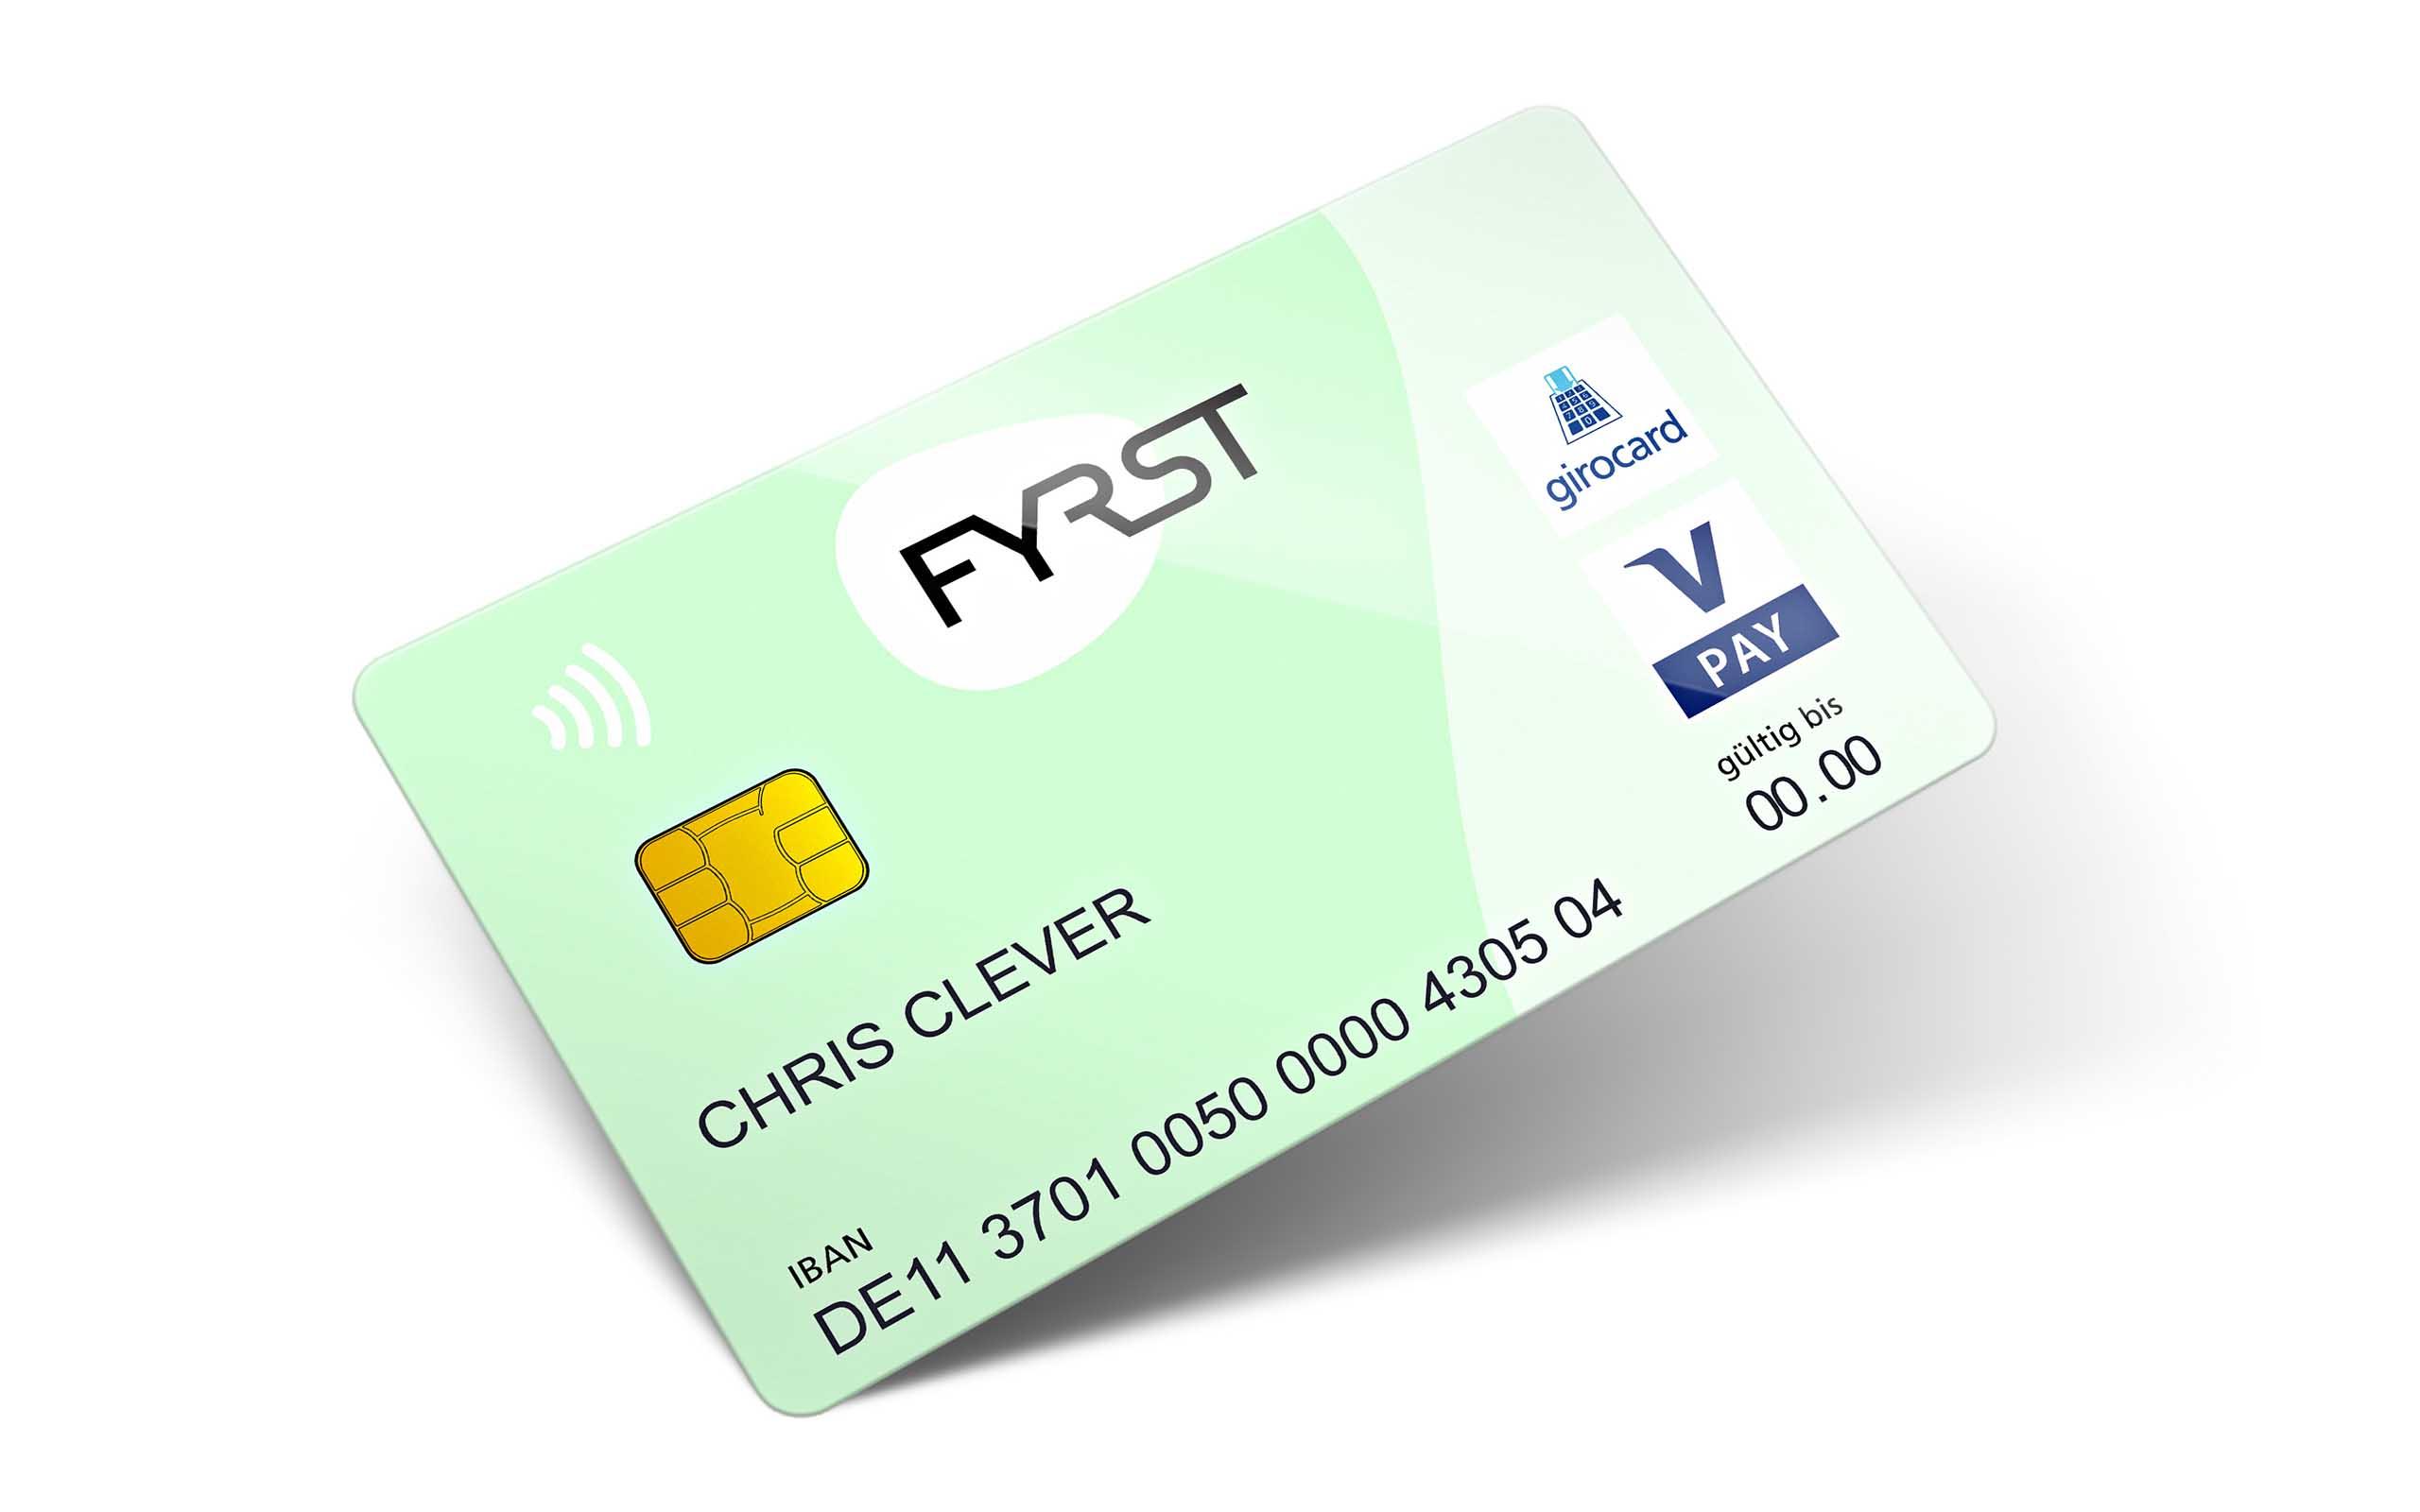 fyrst-bank-test